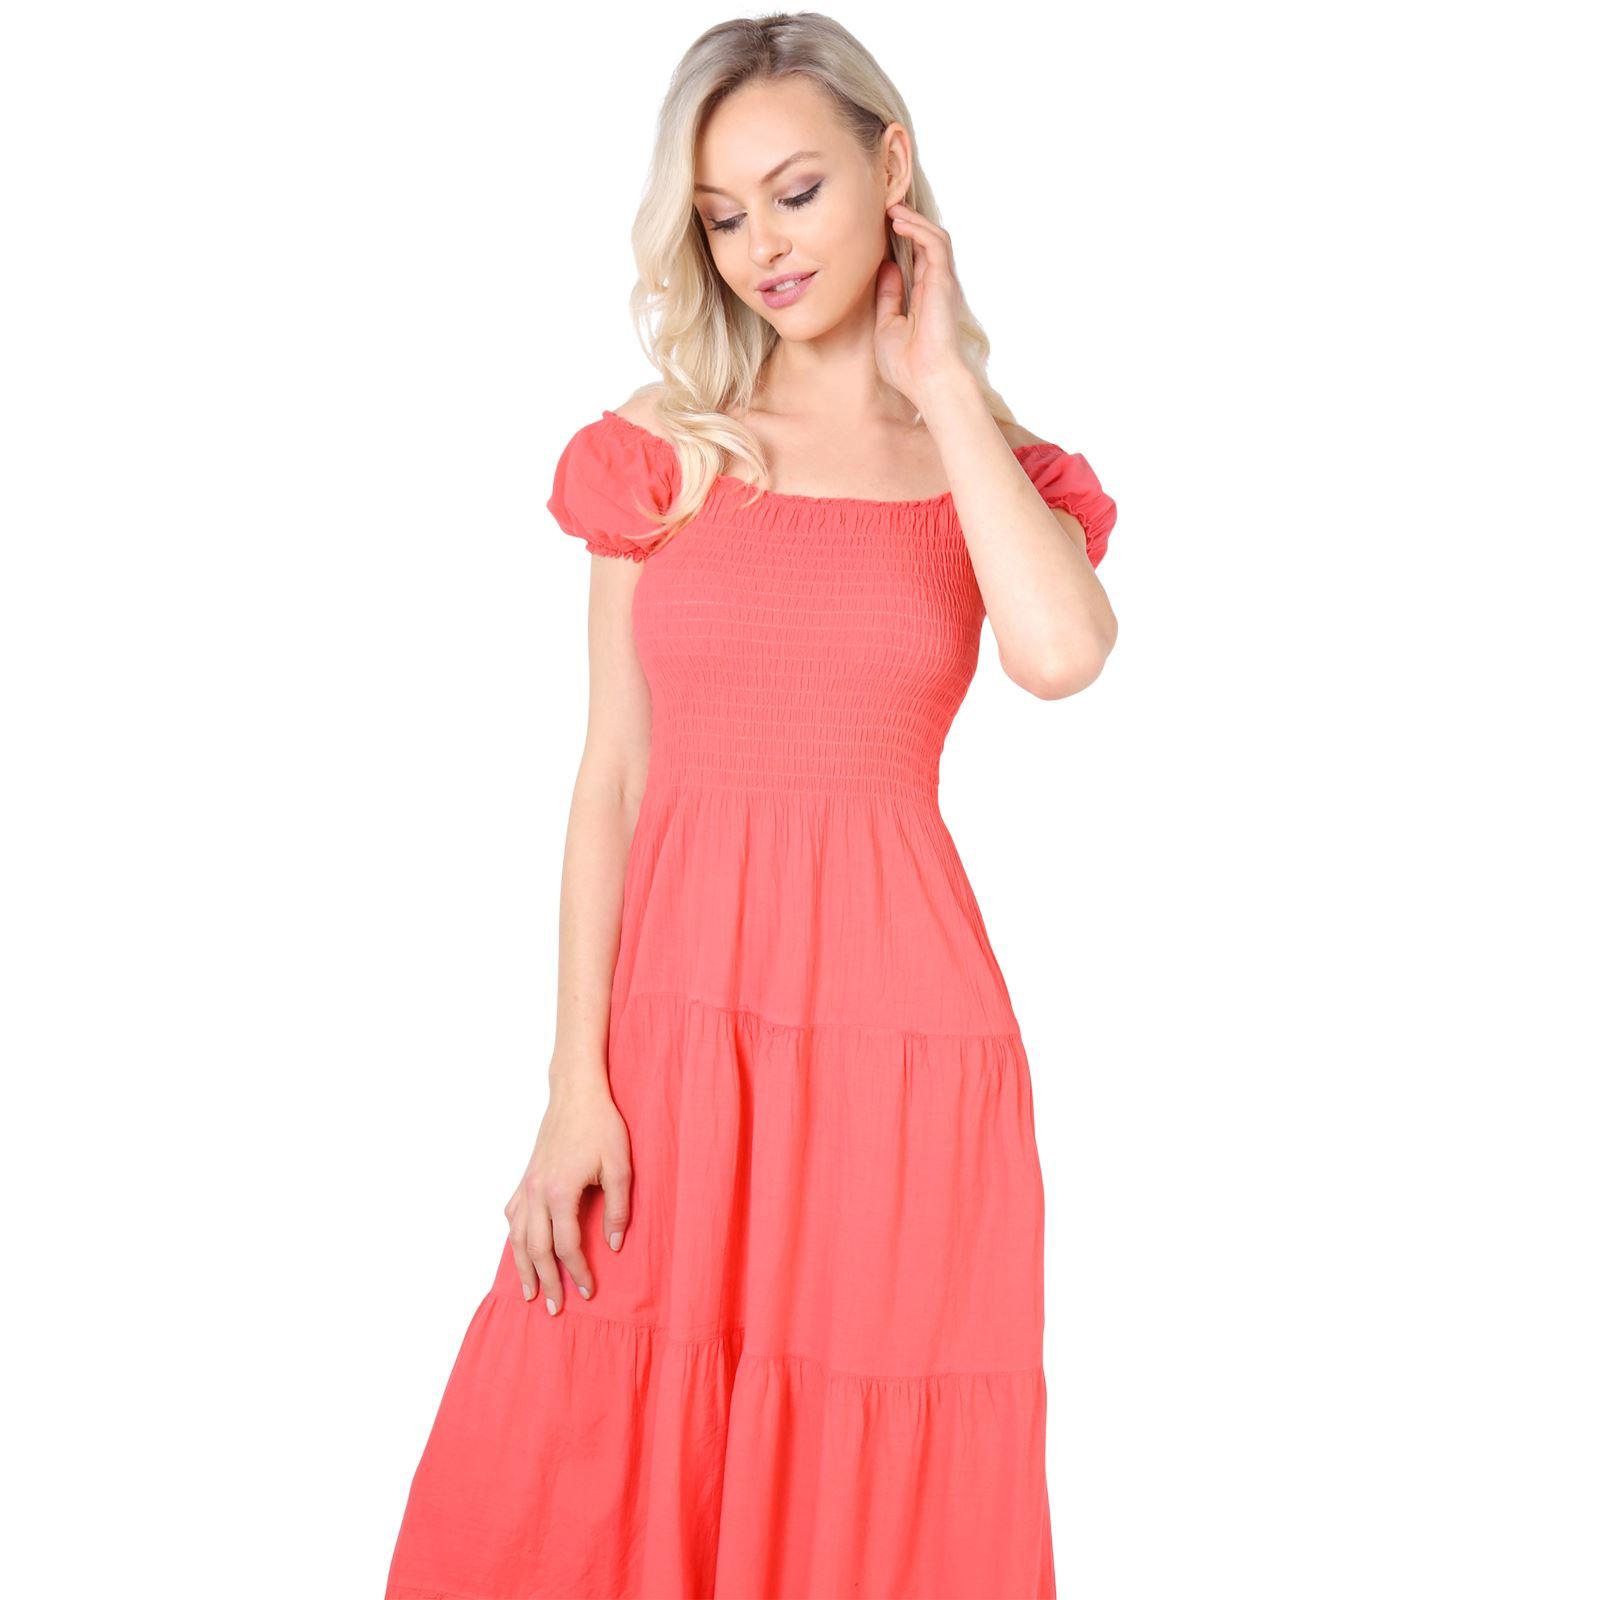 Damen Boho Maxi Kleid Einfarbig Bodenlang Baumwolle Sommer Urlaub ...